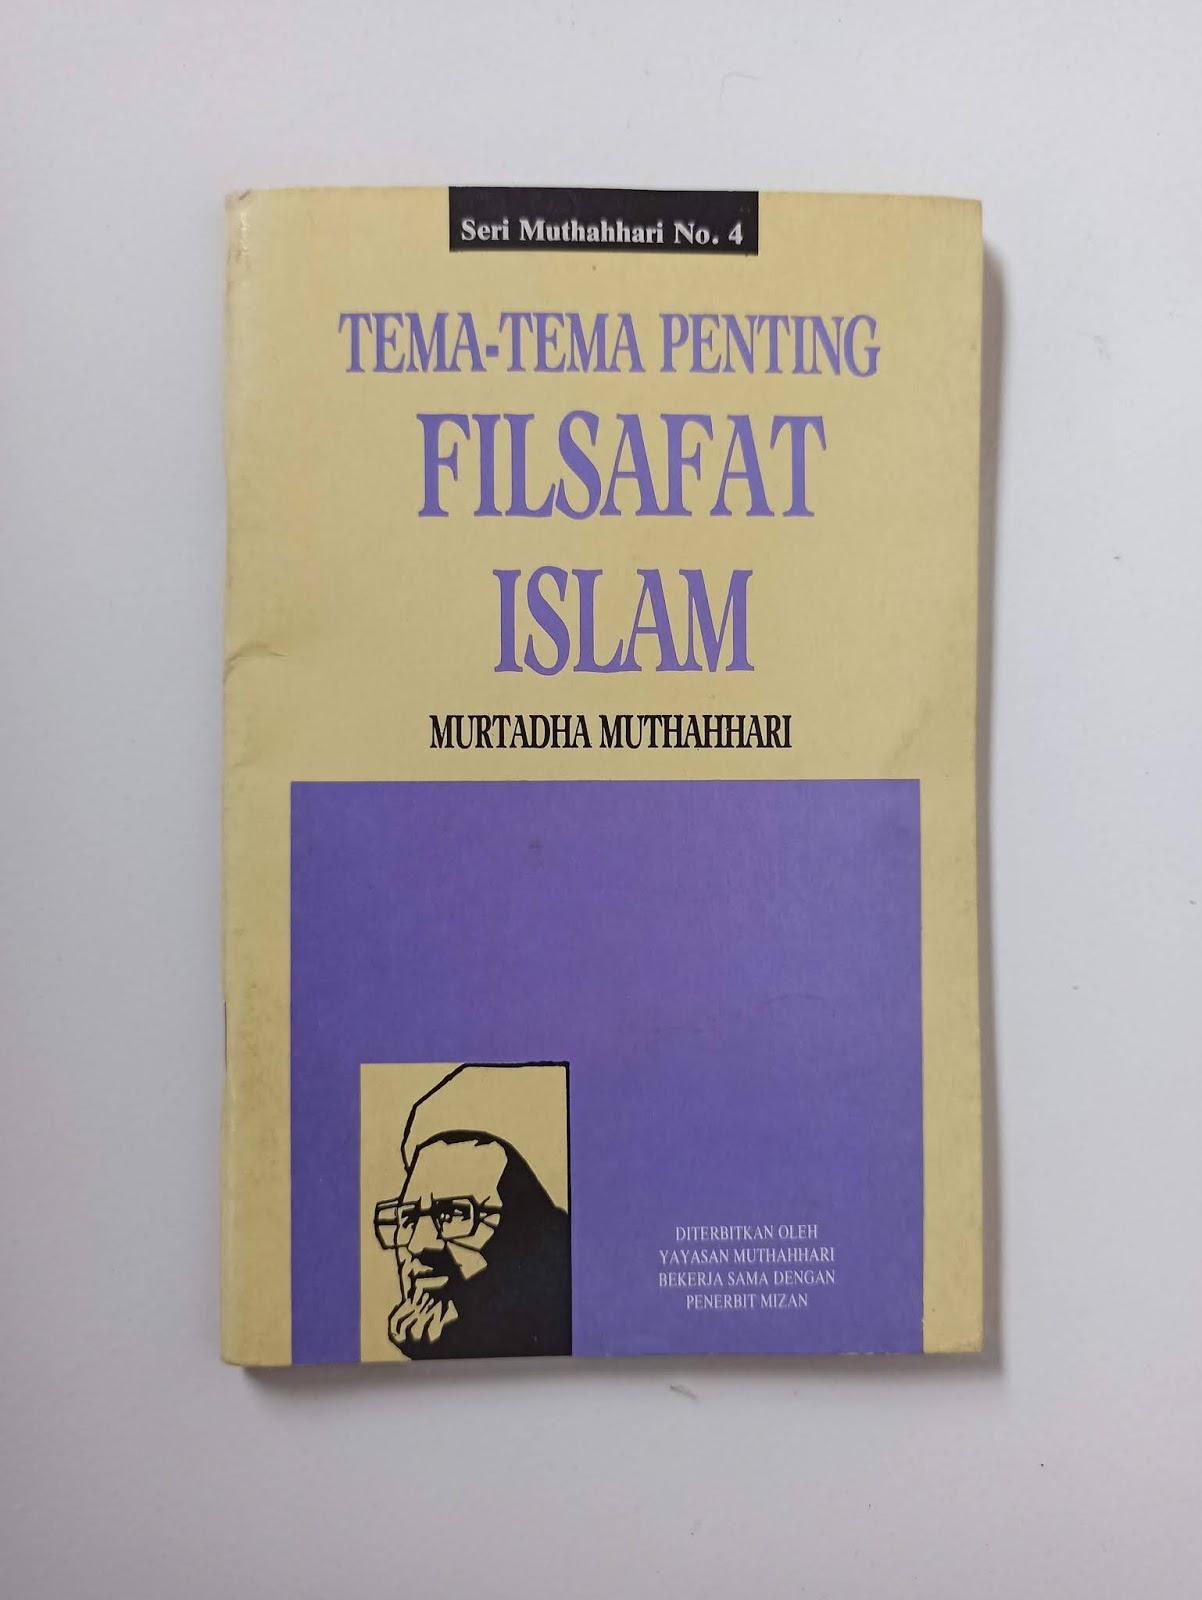 Buku Langka Tema-Tema Penting Filsafat Islam